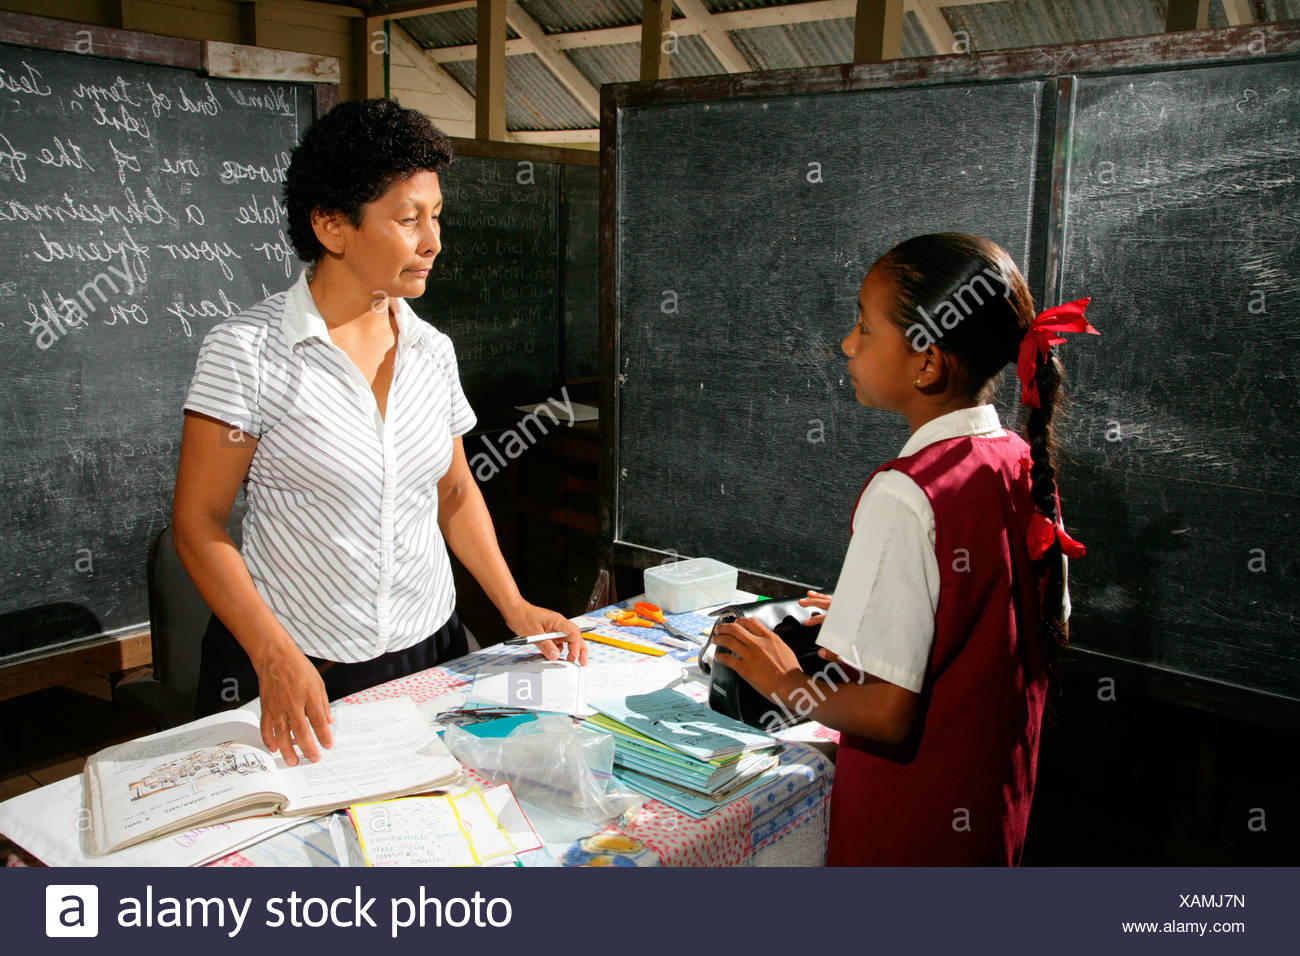 Schoolgirl and her teacher during class, Arawak natives, Santa Mission, Guyana, South America - Stock Image